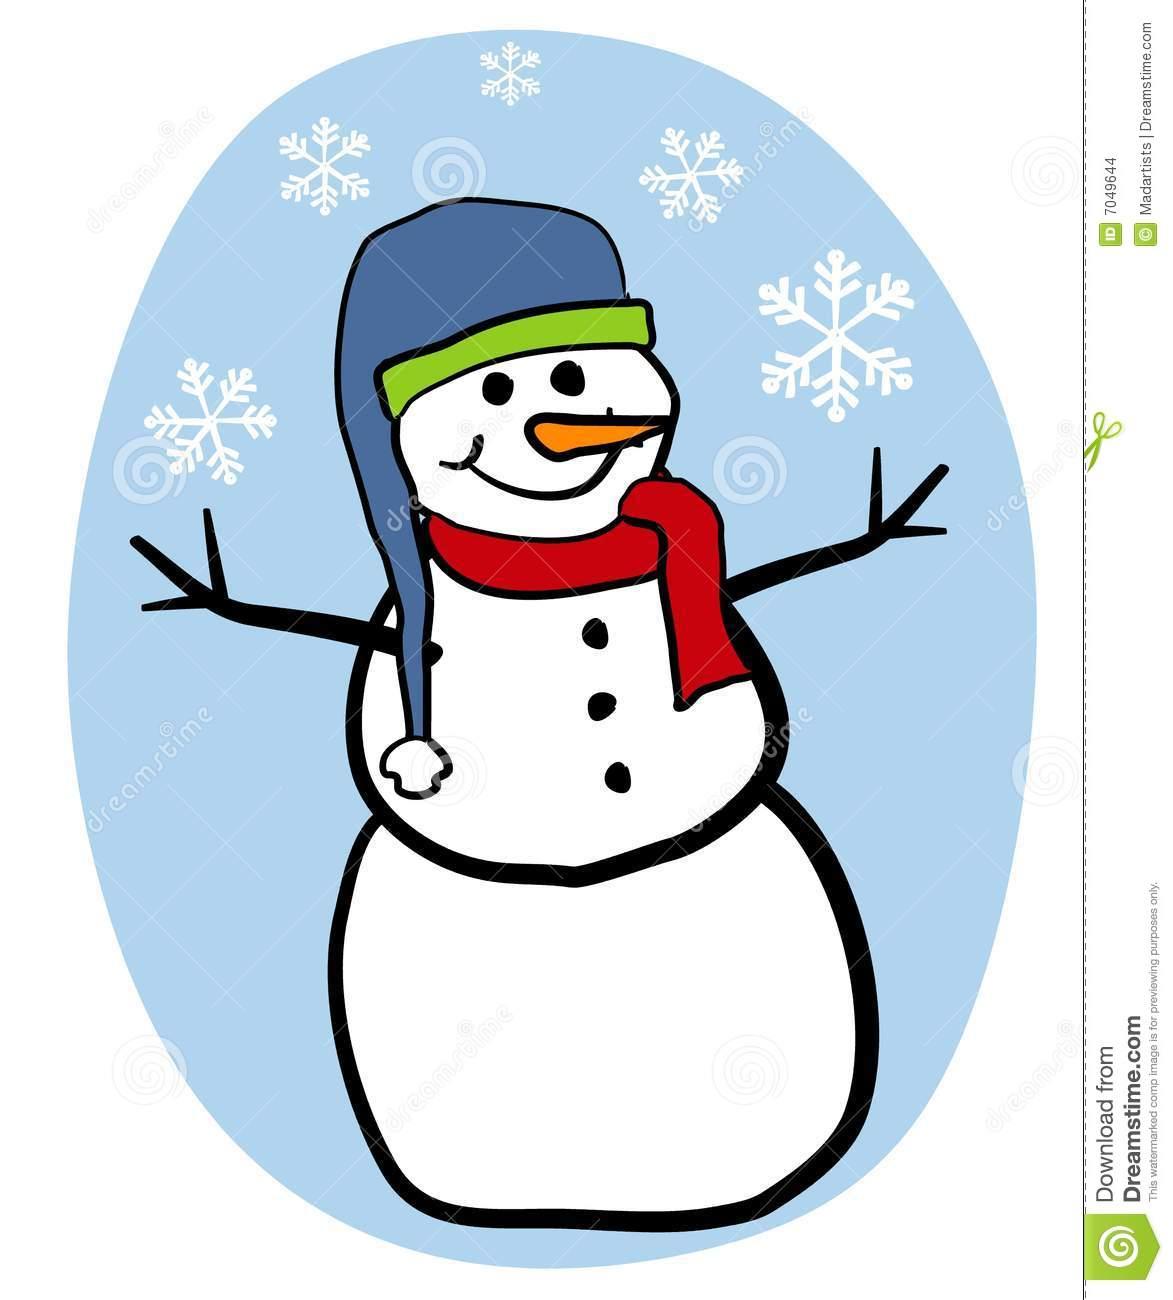 Snowman Clip Art stock illustration. Illustration of cartoon.